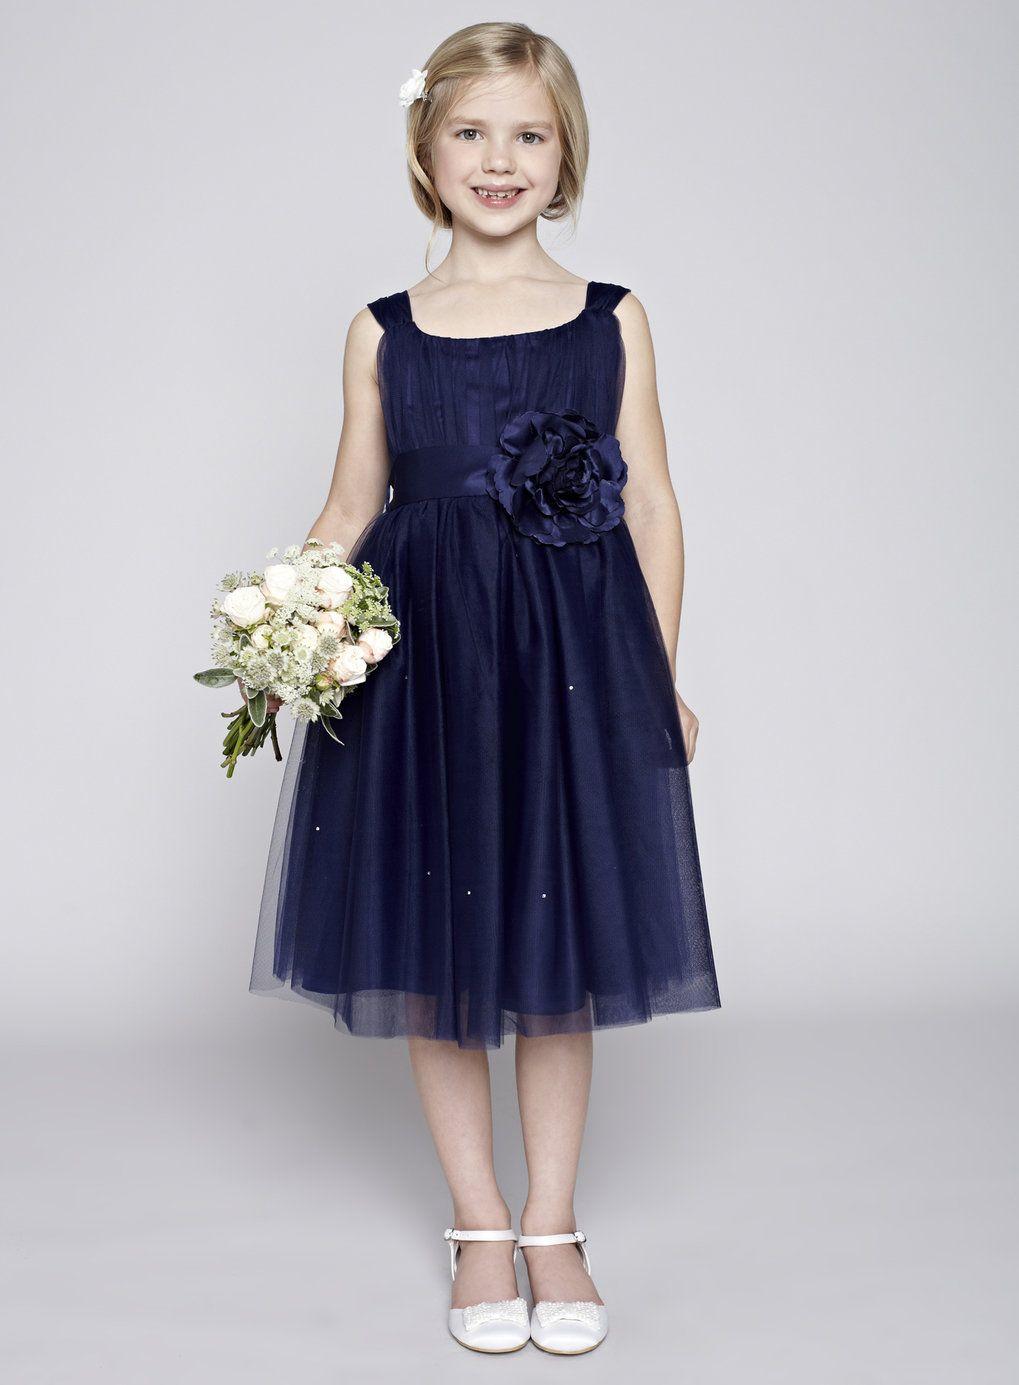 Lola navy flower girl dress bhs wedding ideas pinterest lola navy flower girl dress bhs ombrellifo Gallery